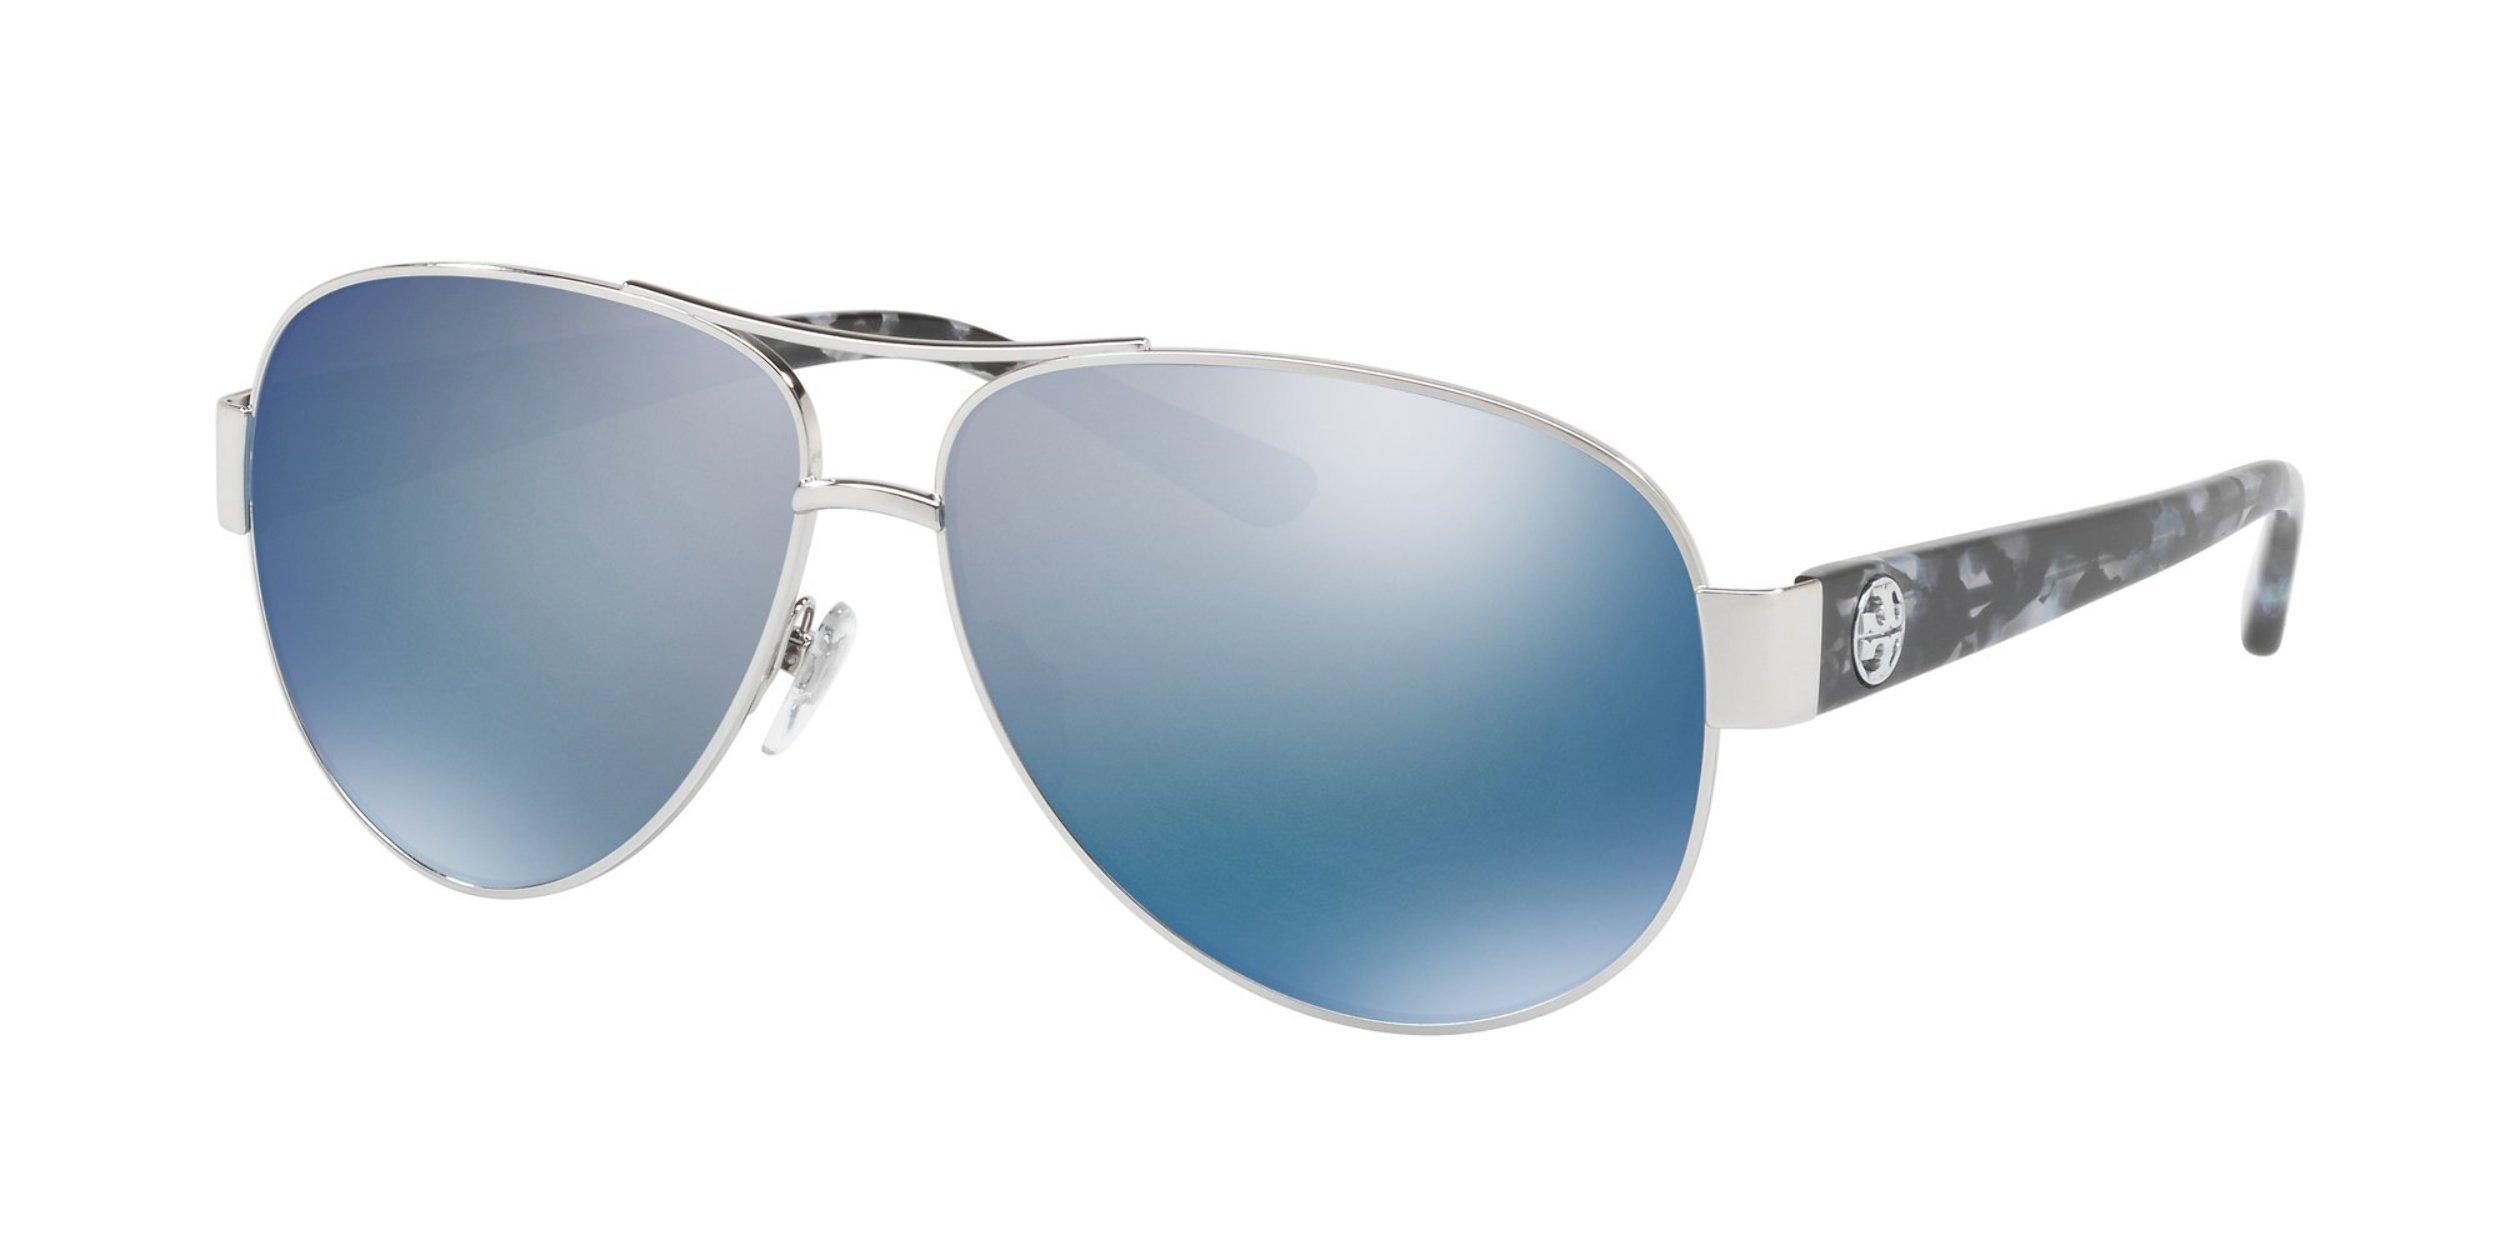 Tory Burch Women's 0TY6057 Silver/Blue Flash Polarized Mirror Sunglasses